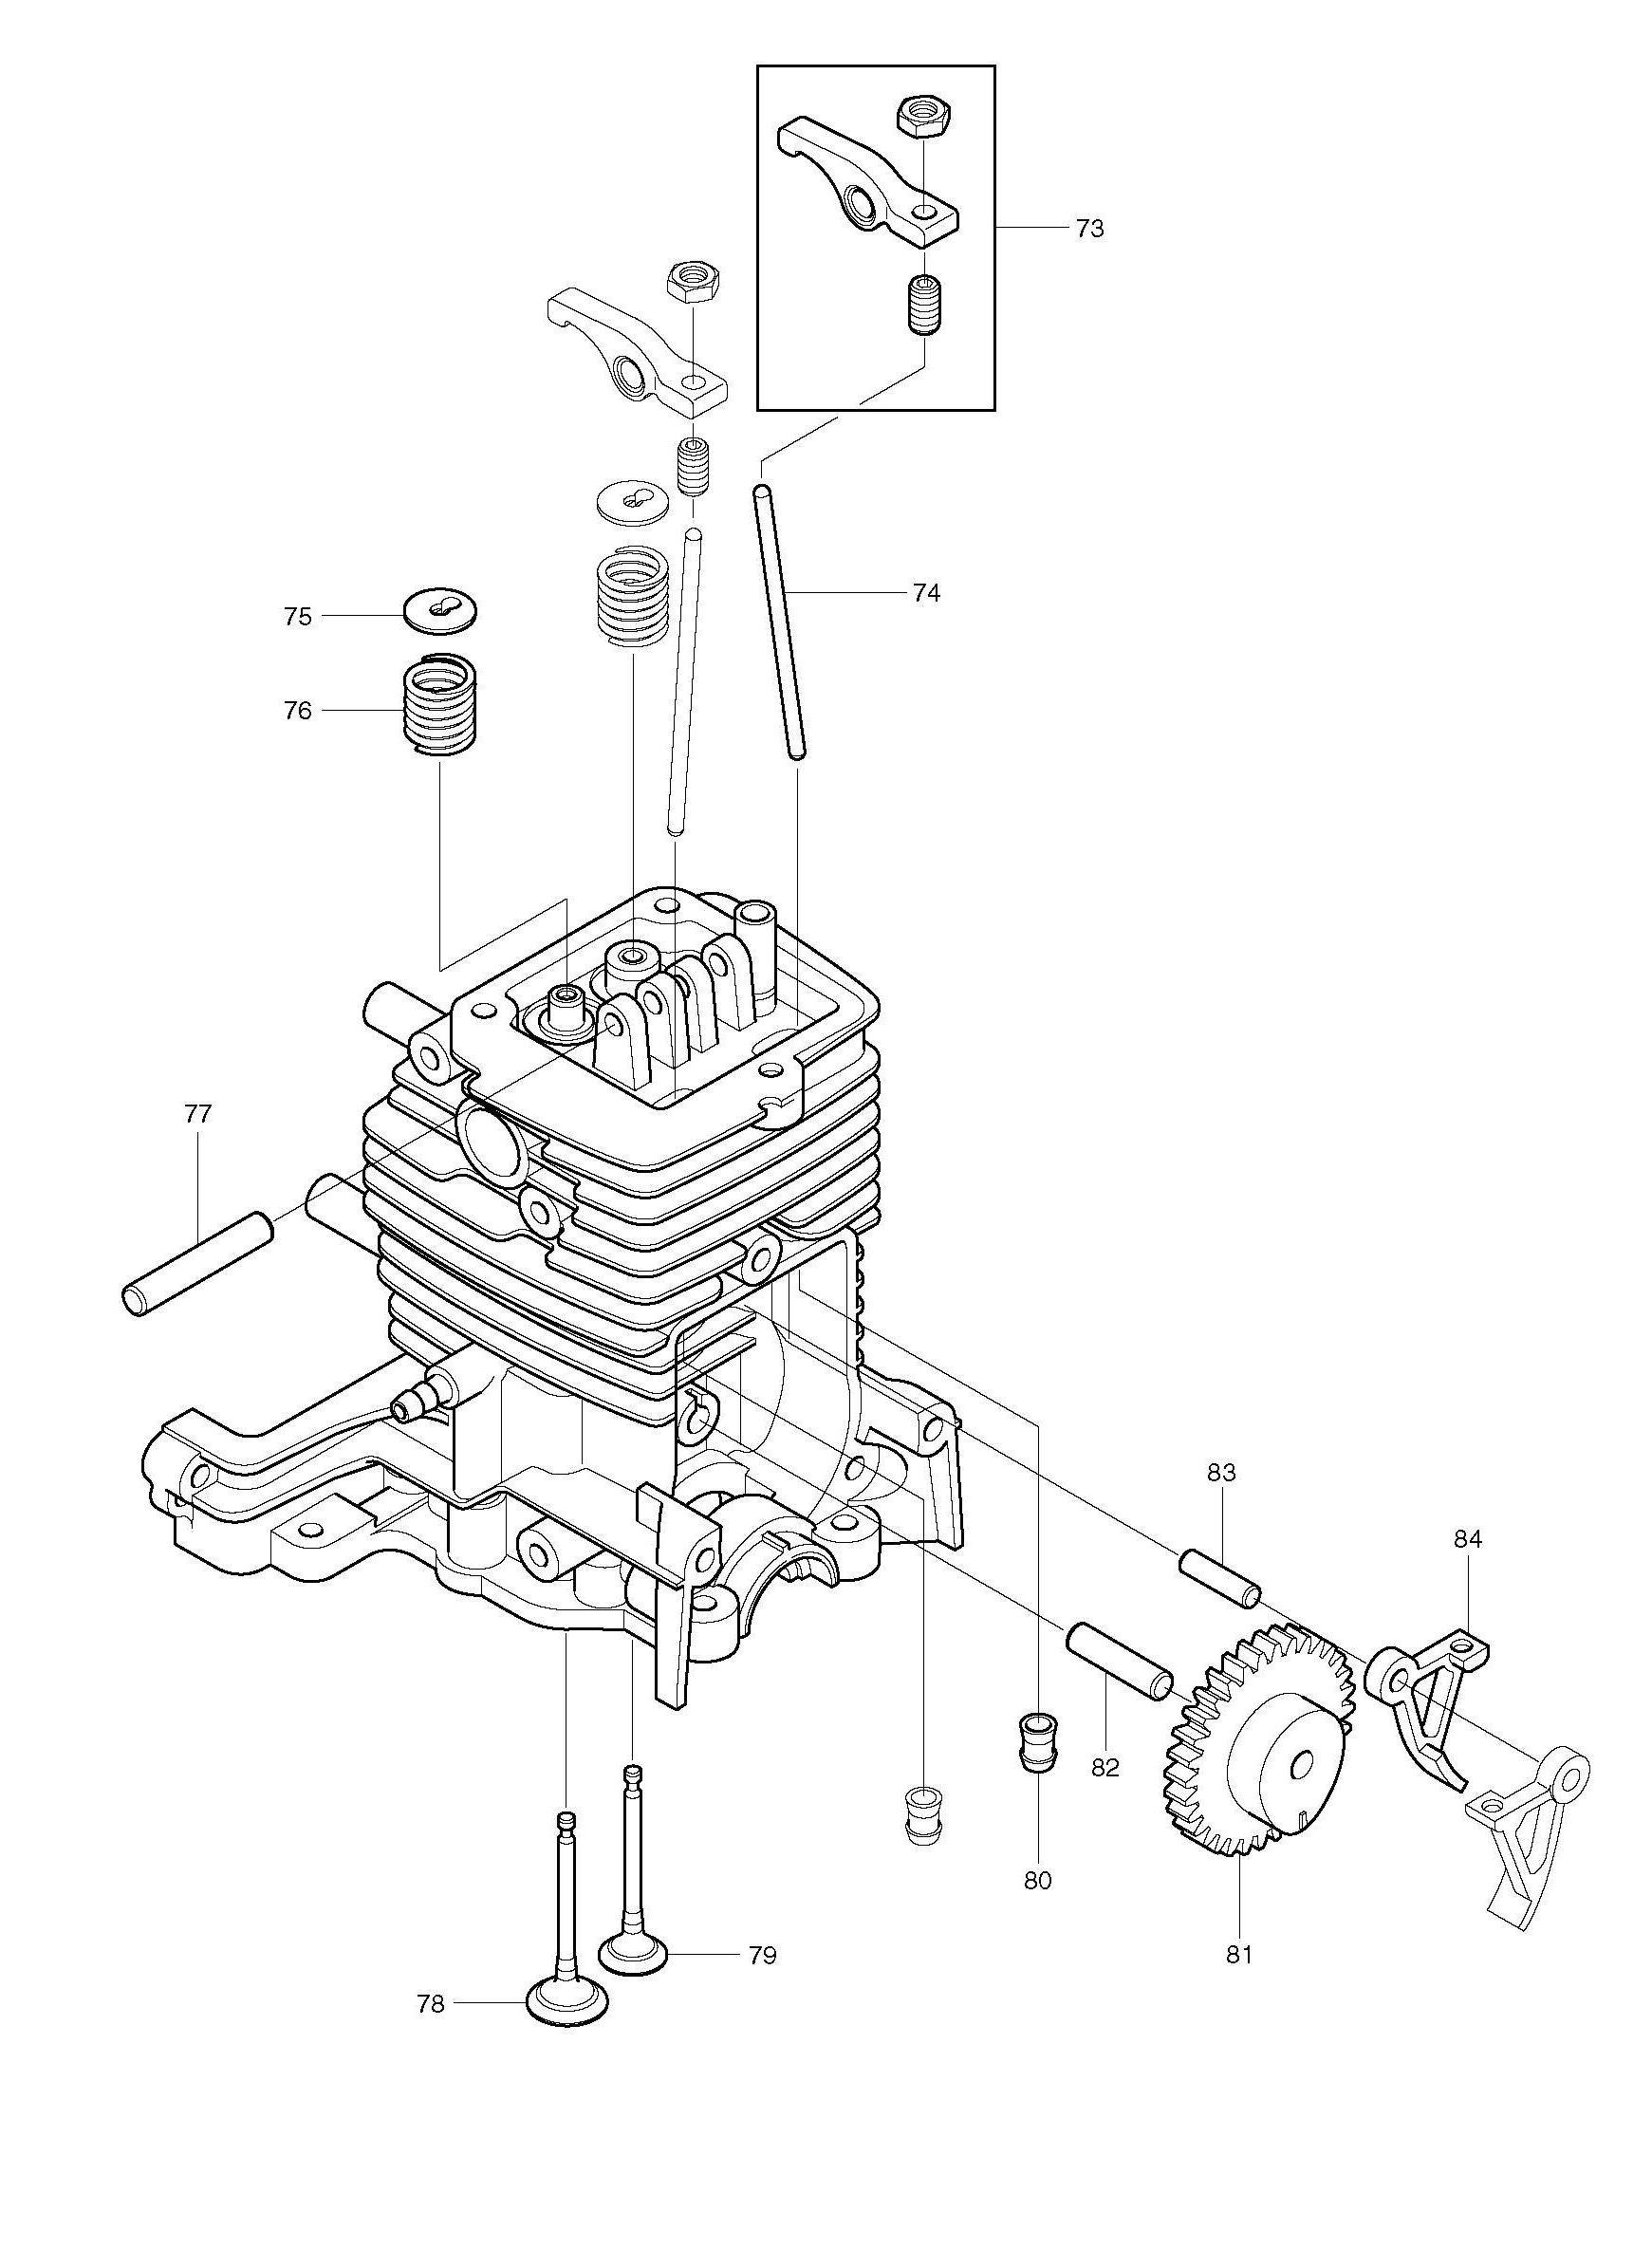 Diagram Of Four Stroke Petrol Engine